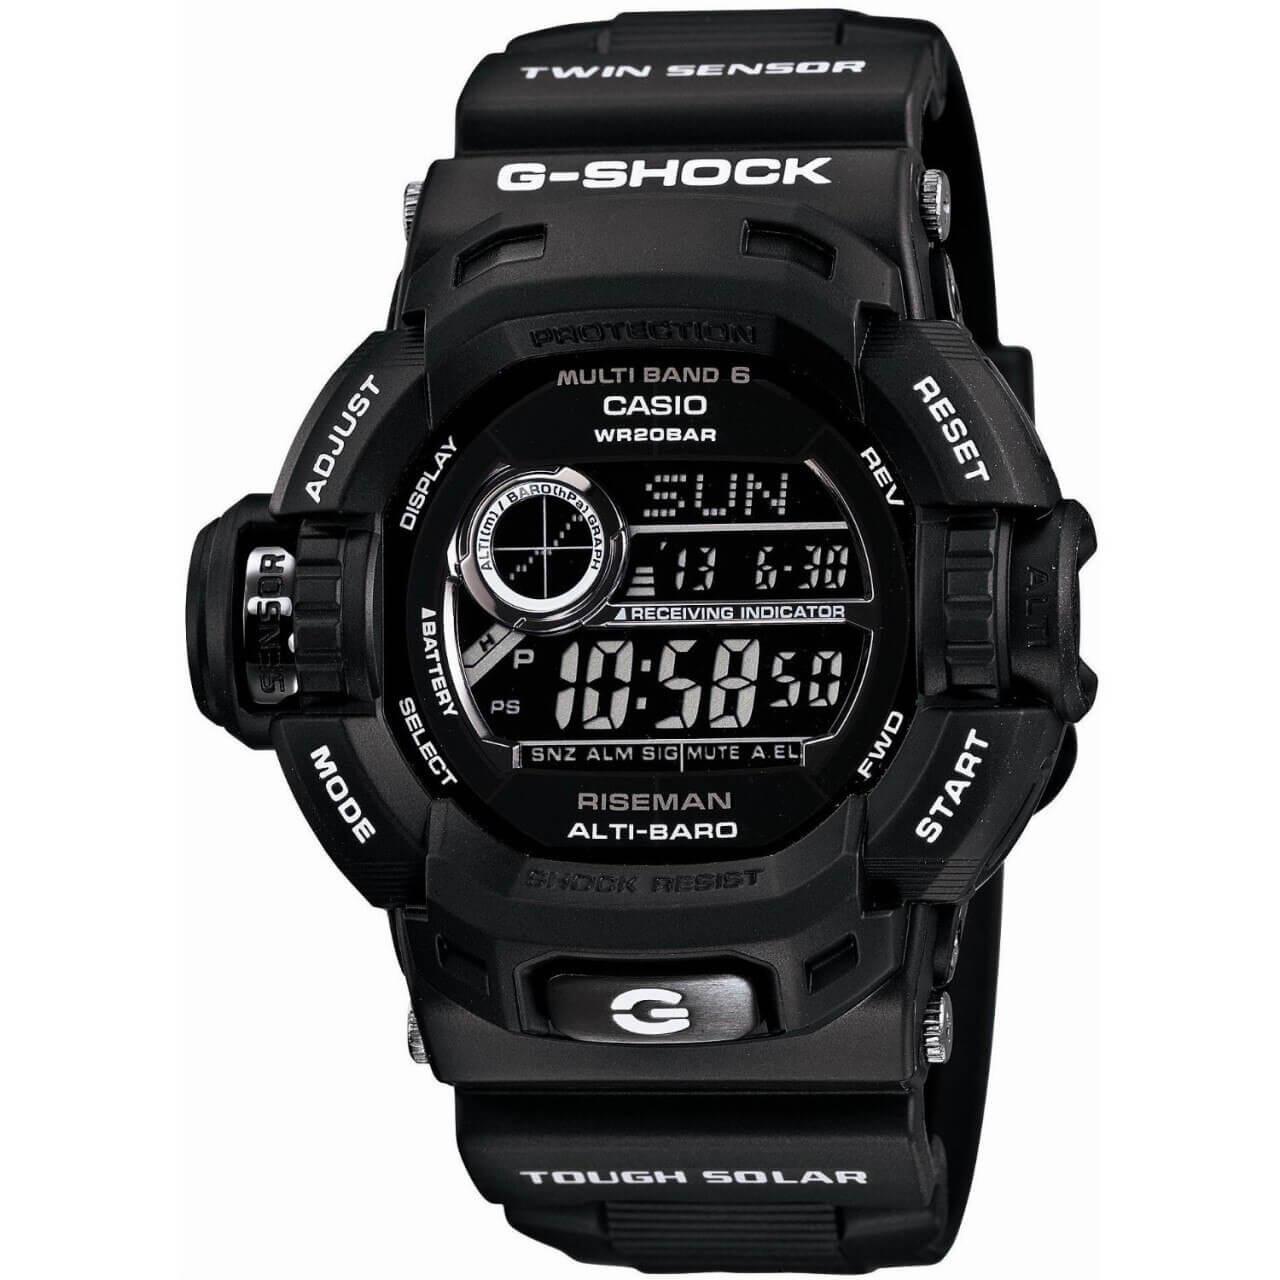 Casio G-Shock Riseman GW-9200BWJ-1JF Garish Black